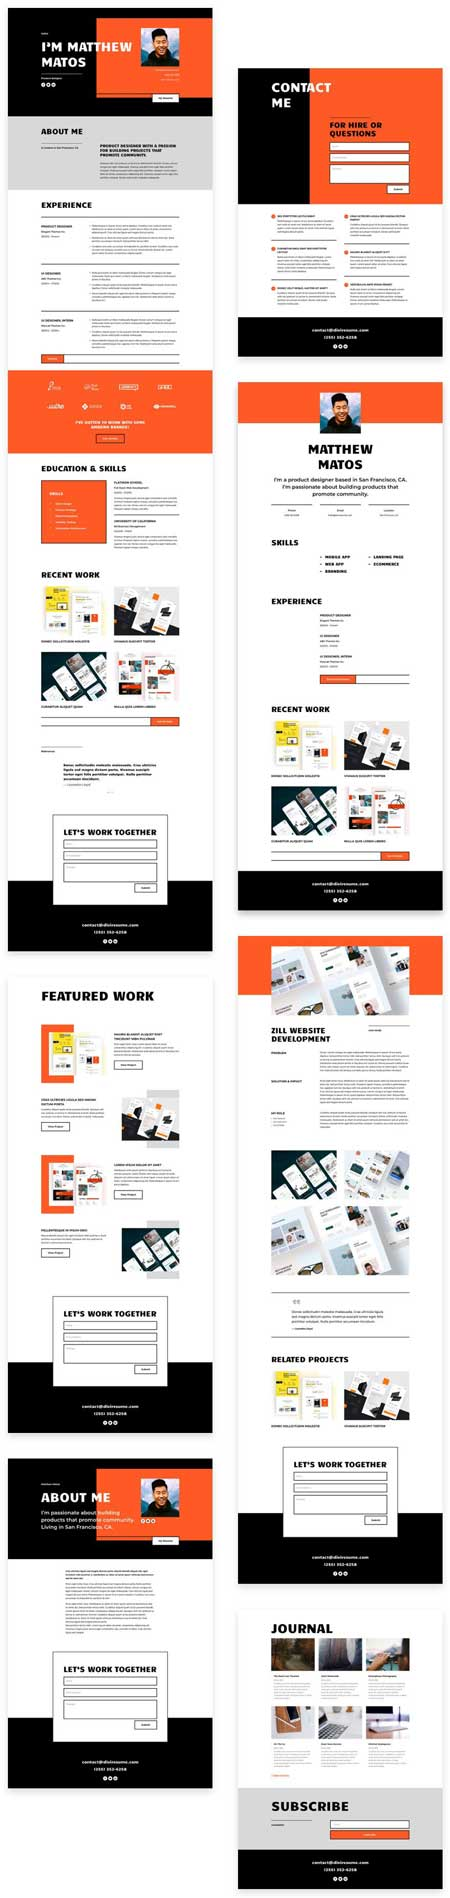 Divi Creative CV Layout Pack